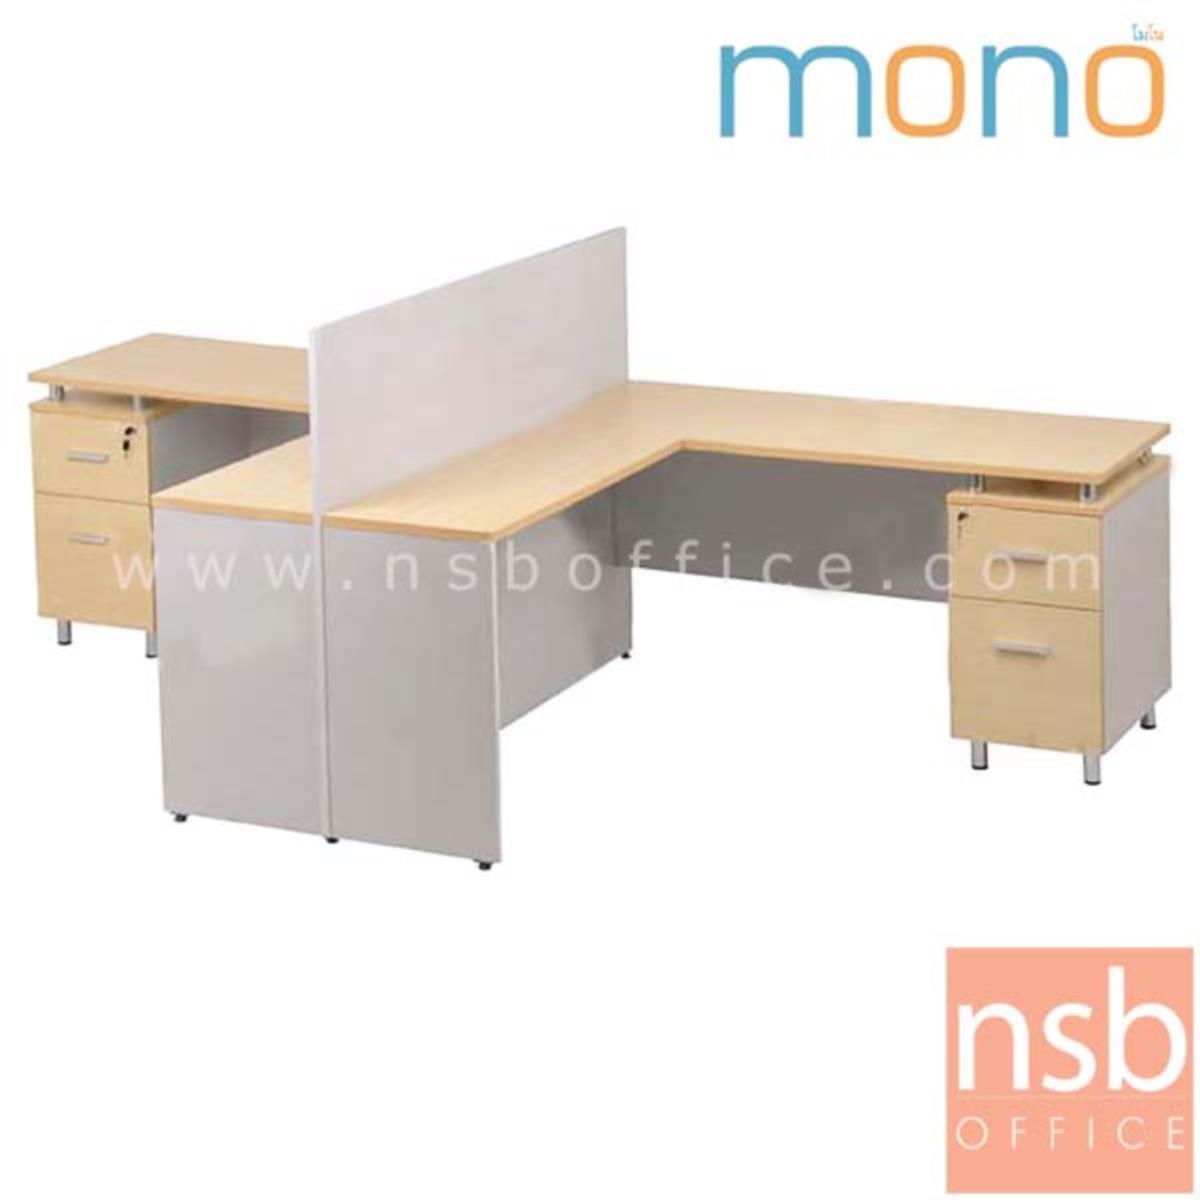 A27A033:ชุดโต๊ะทำงานกลุ่มตัวแอล 2 ที่นั่ง  รุ่น MN-TYW2832 ขนาด 280W ,320W cm. พร้อมไม้กั้นระหว่างโต๊ะ